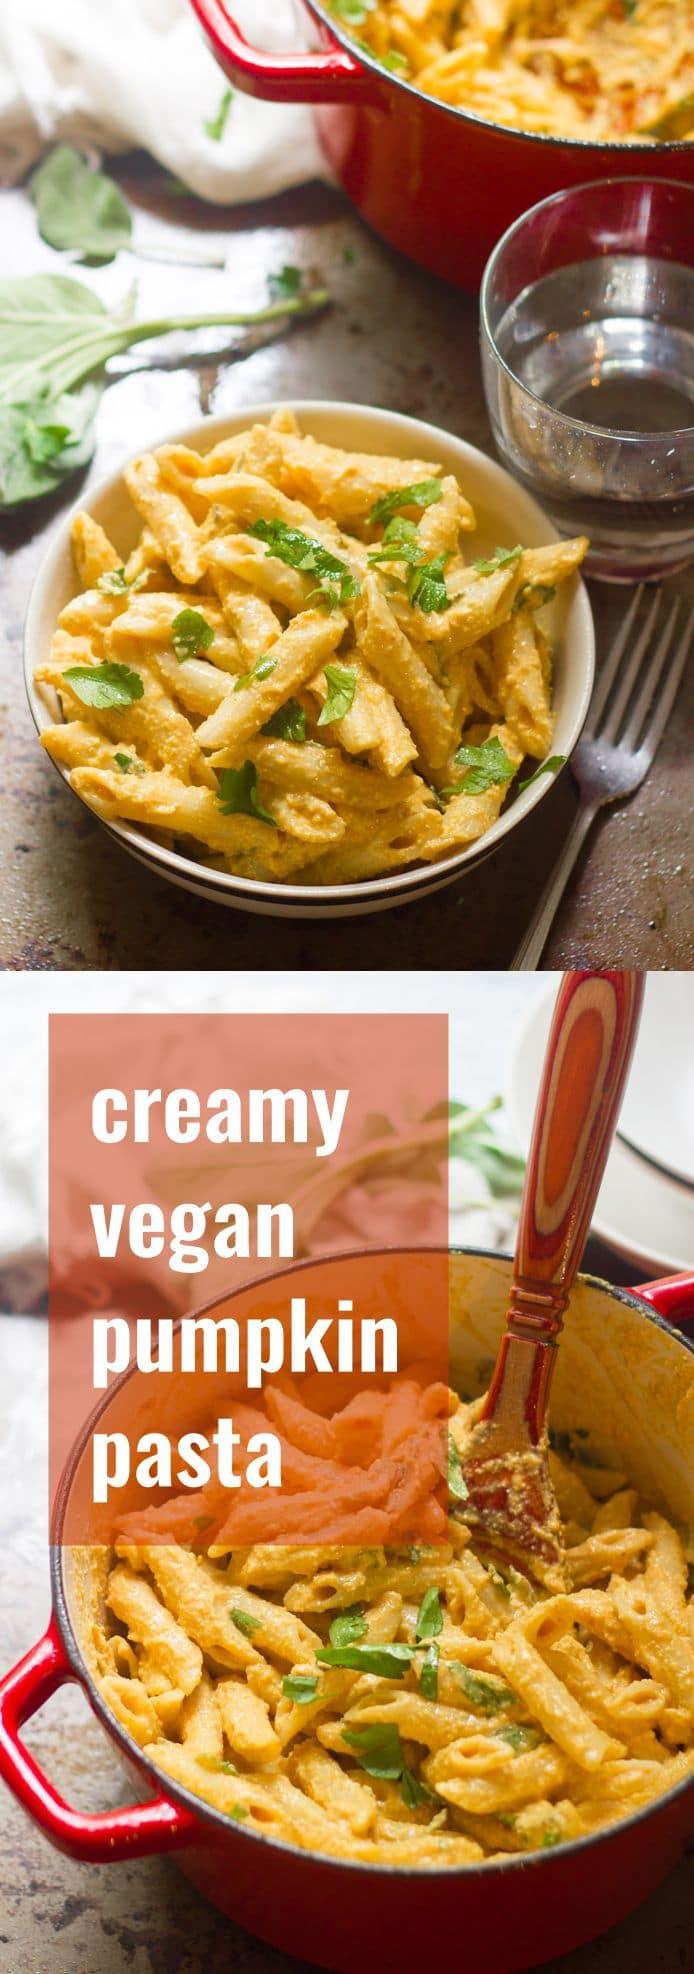 Creamy Vegan Pumpkin Pasta